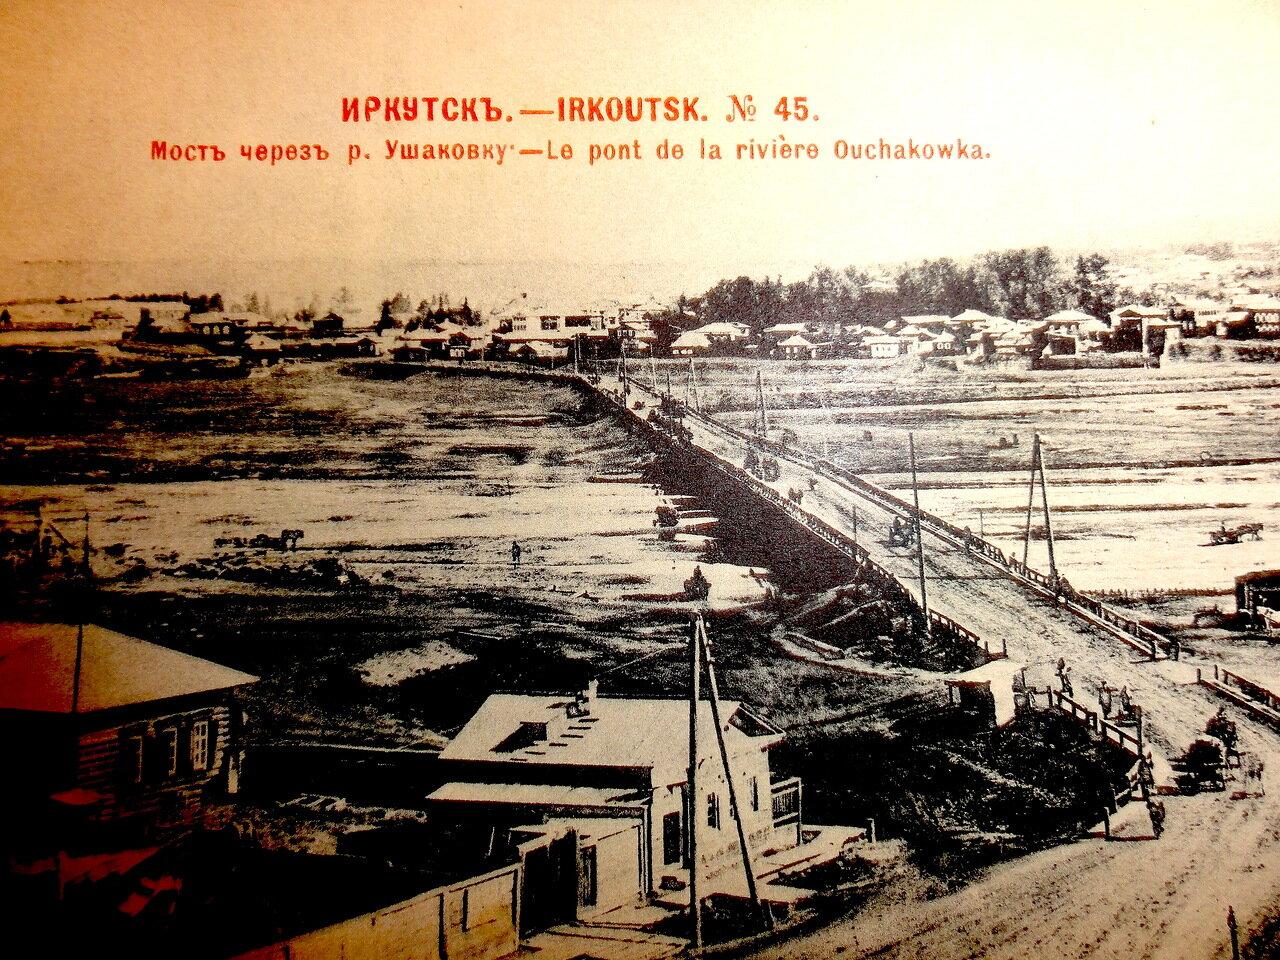 Мост через реку Ушаковку